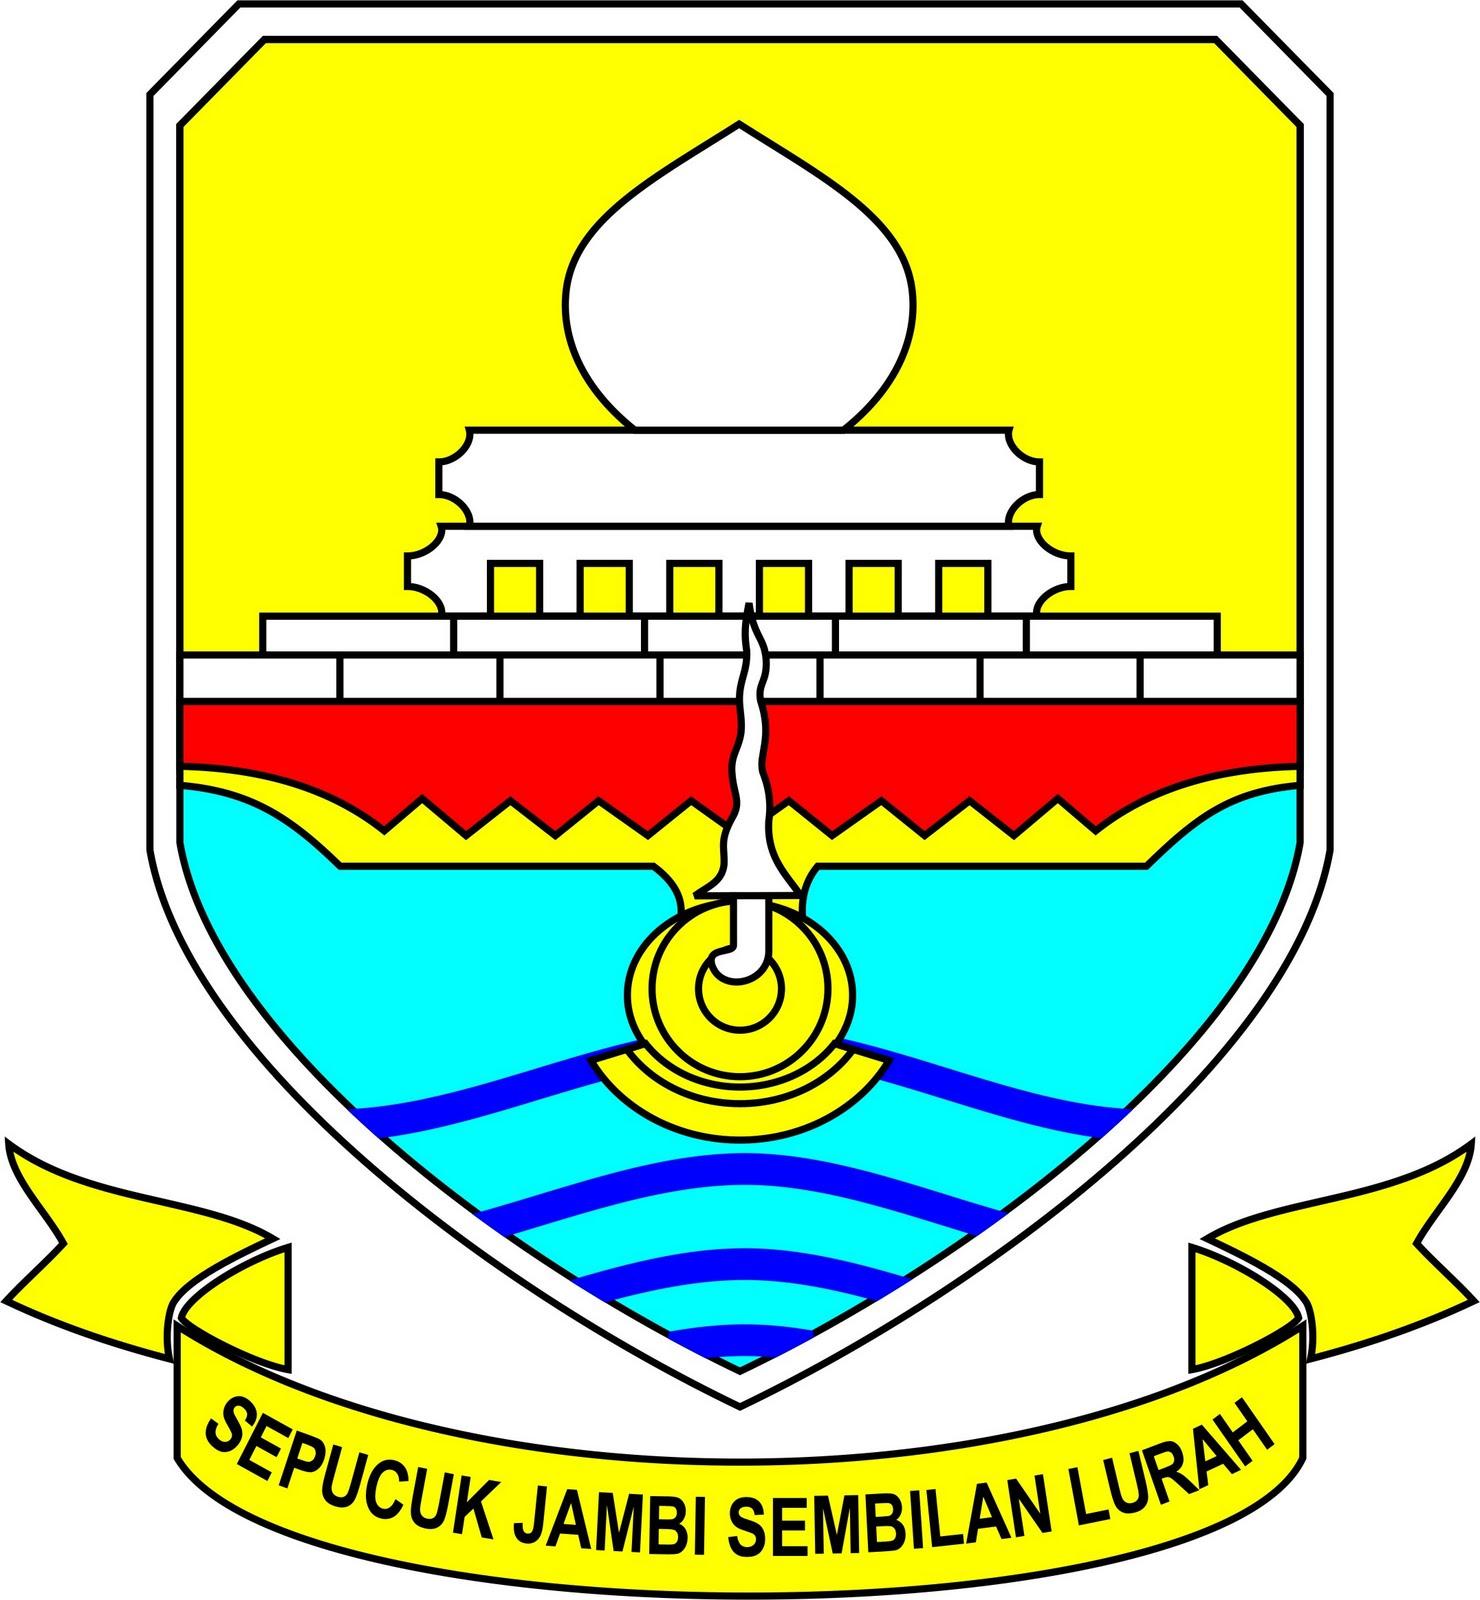 lambang daerah tingkat i provinsi jambi sepucuk jambi sembilan lurah